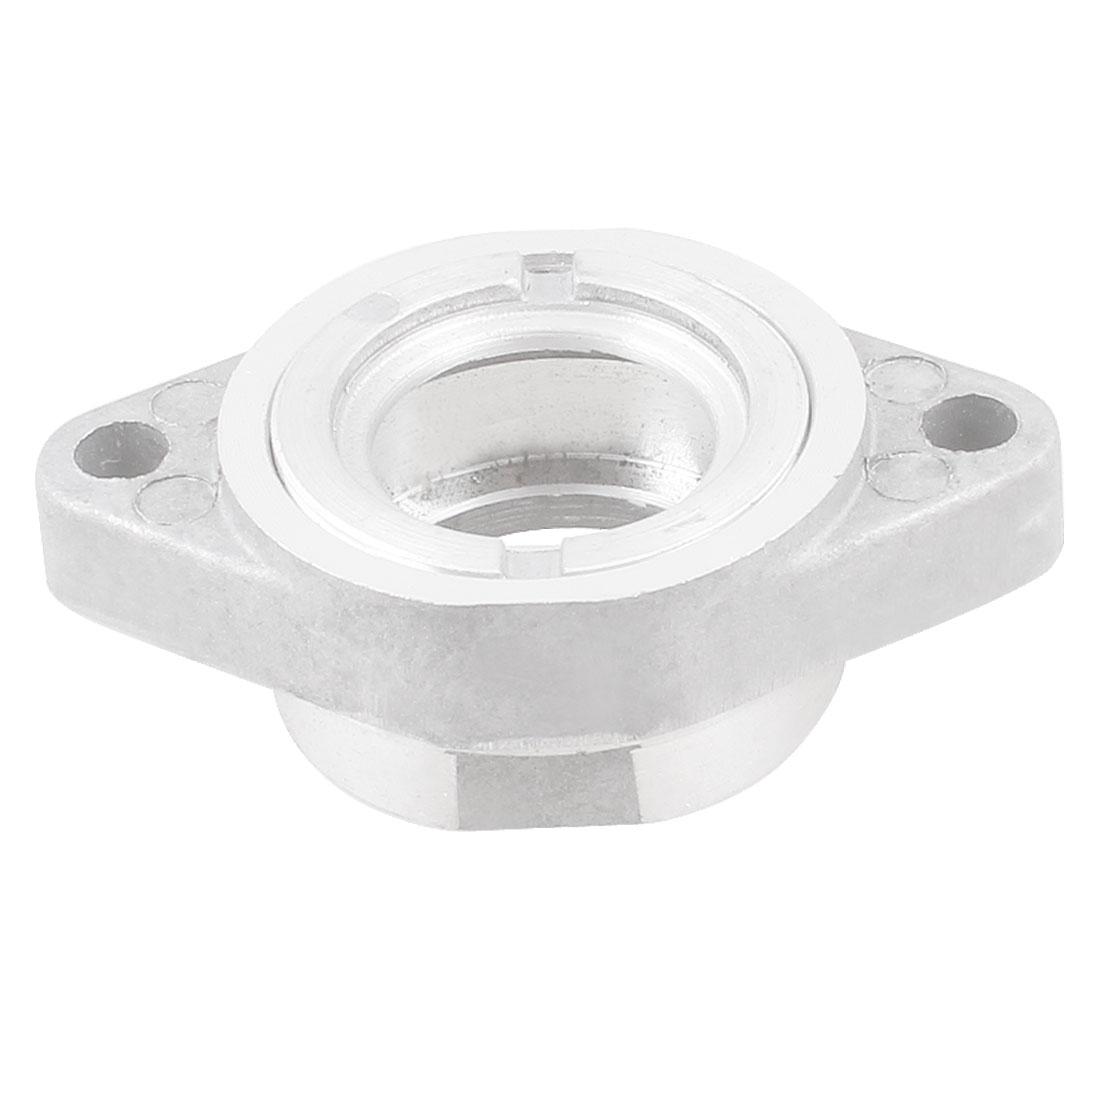 Silver Tone Metal Bearing Base for Hitachi 110 CM4SB2 Stone Cutting Machine